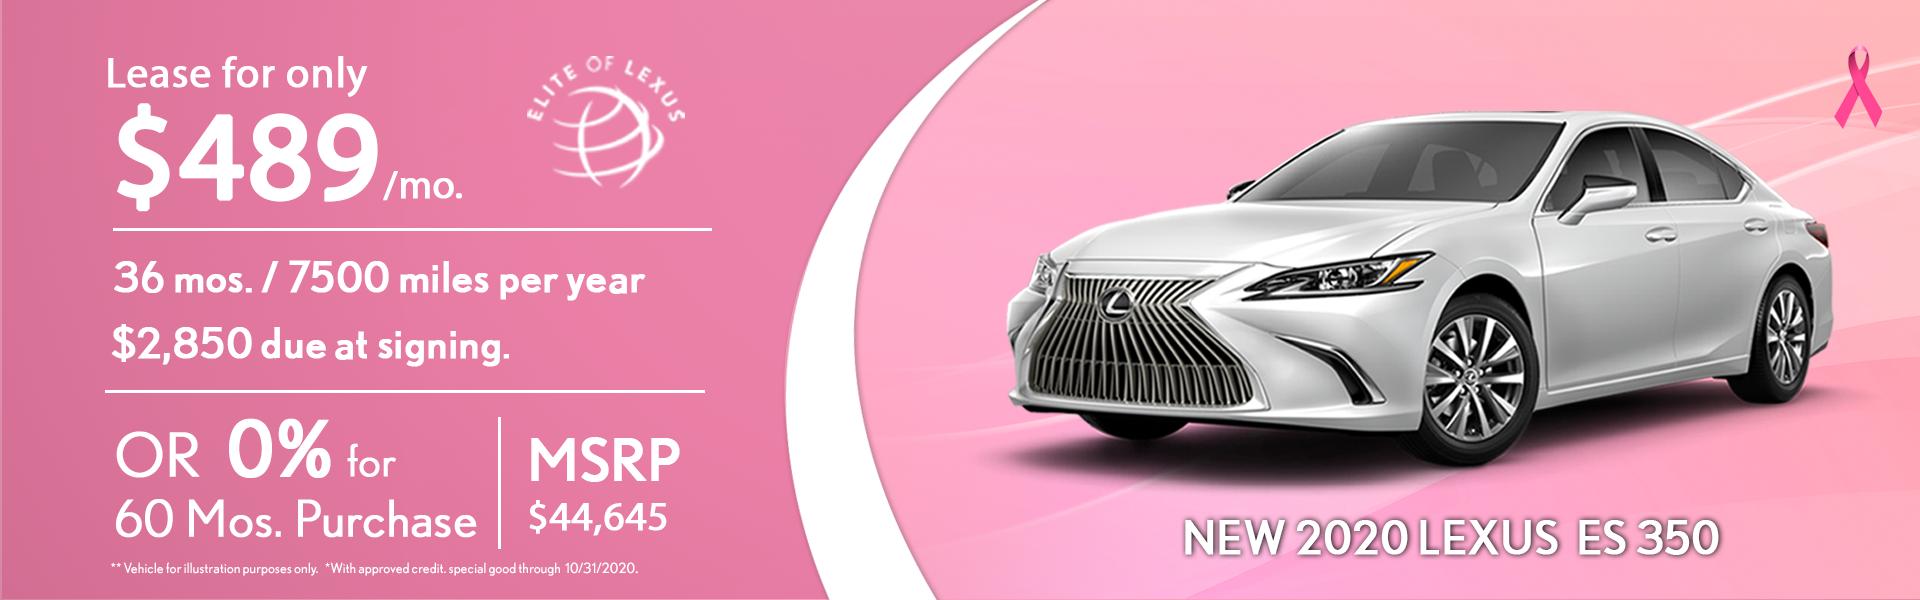 LEXUS 2020 ES 350 Lease Special